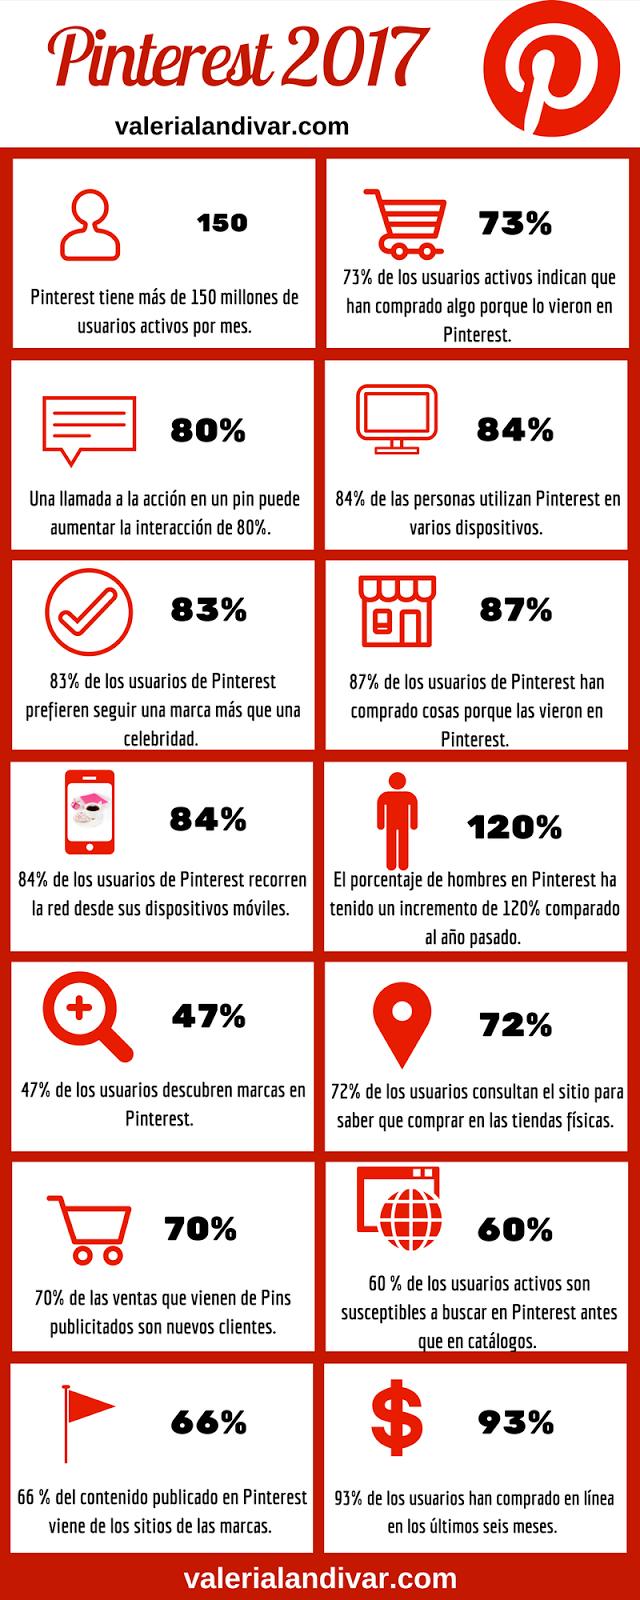 Datos clave sobre Pinterest